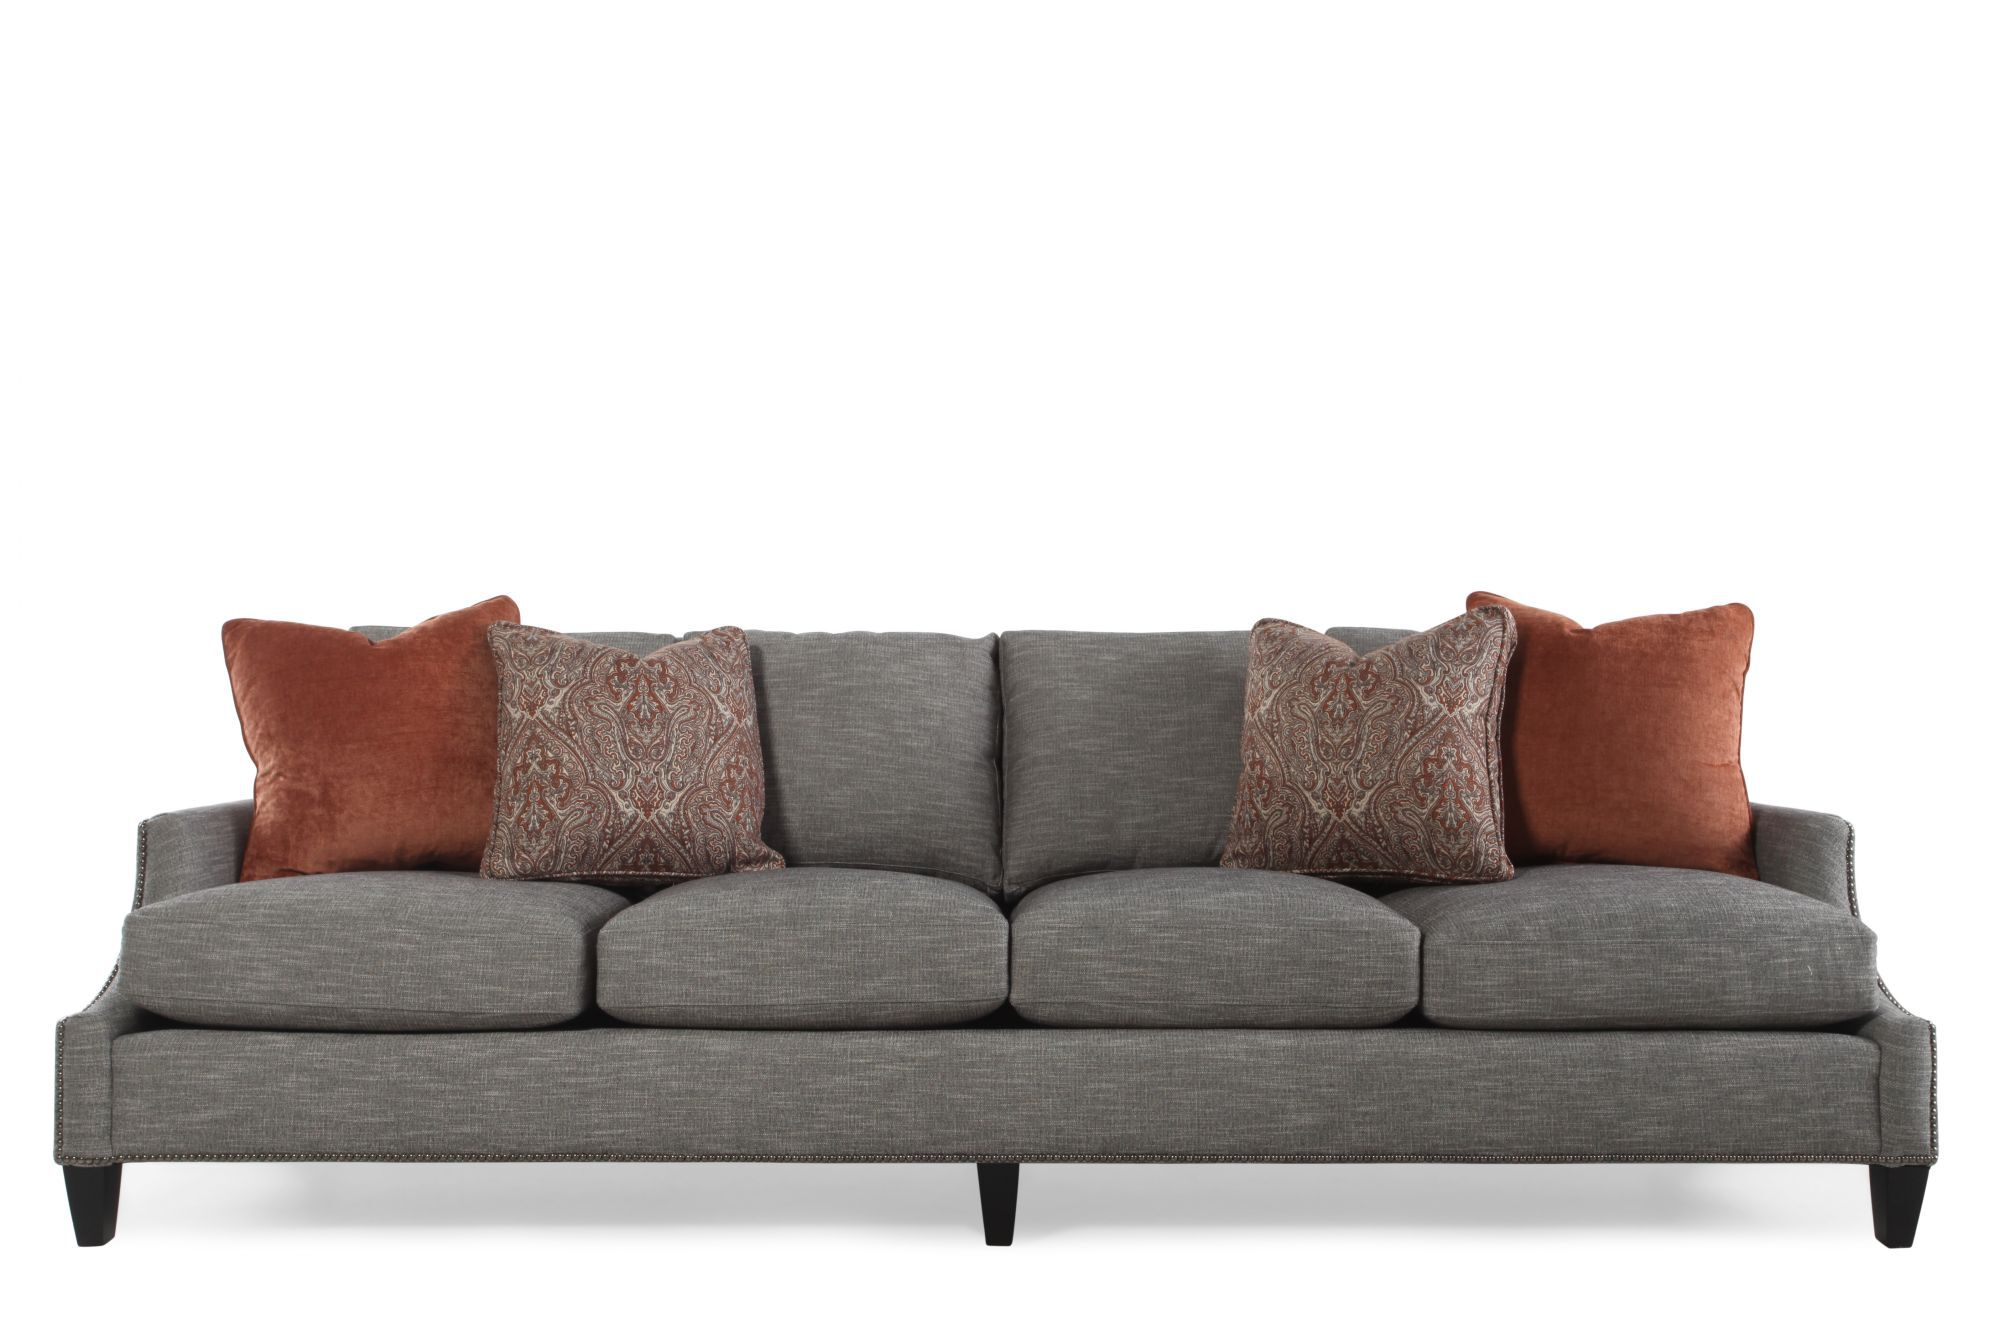 bernhardt furniture sofa velvet upholstered crawford mathis brothers